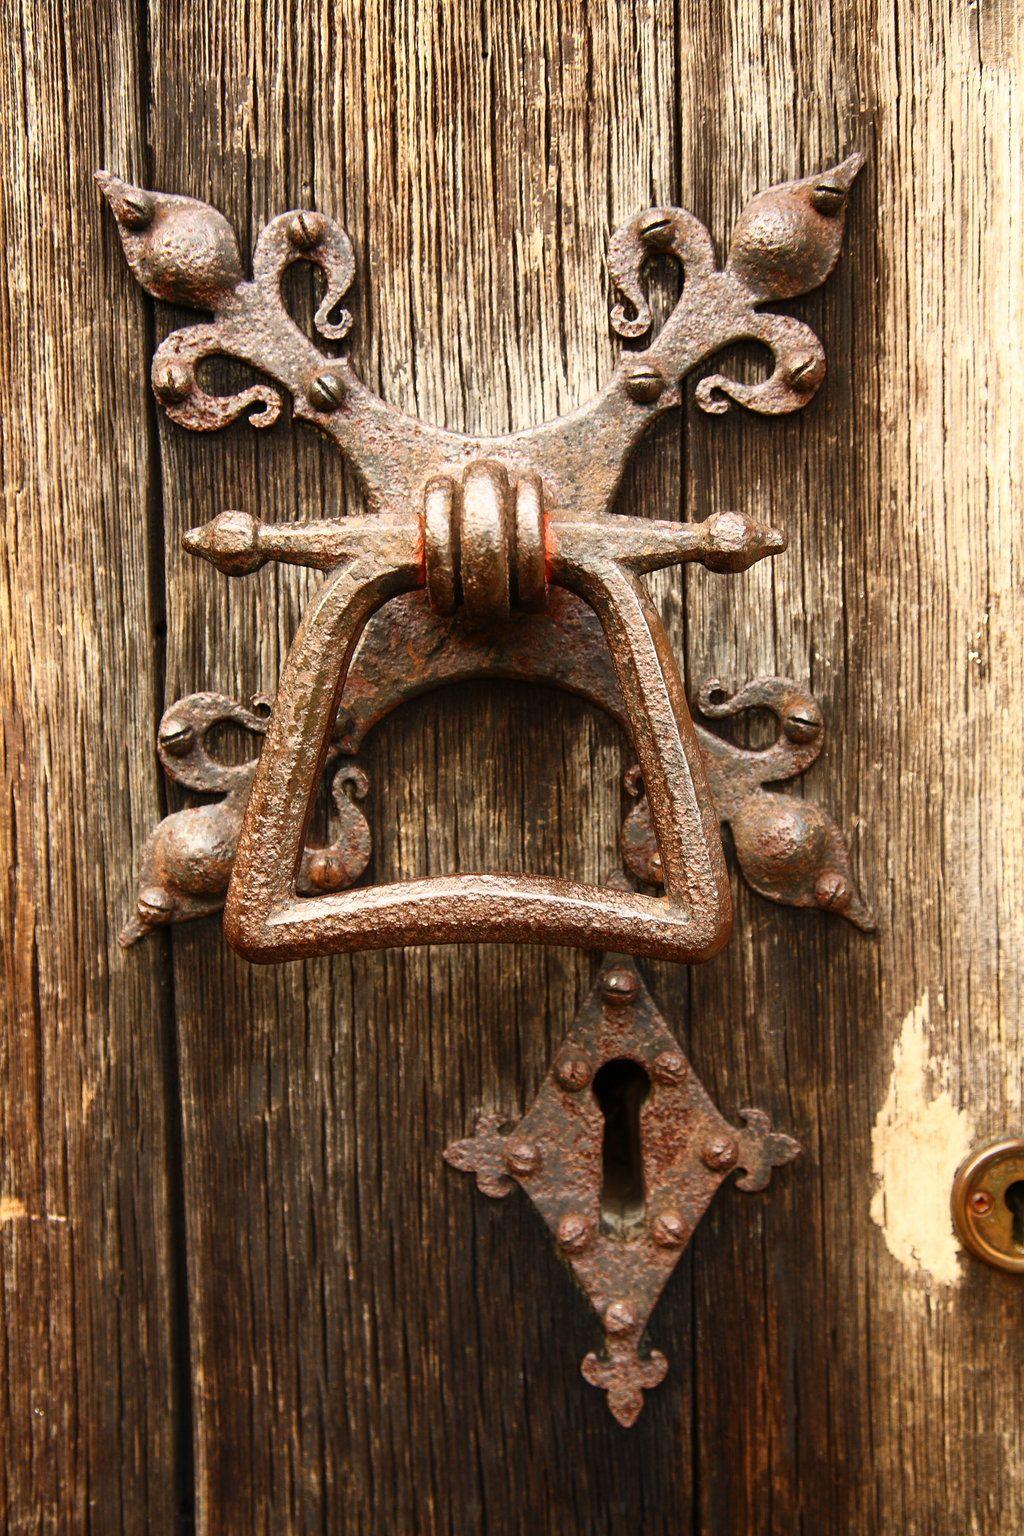 antique door knobs hardware. Drooling All Over This Hardware!! -Old Door Handle By NickiStock.deviantart.com On @deviantART Antique Knobs Hardware